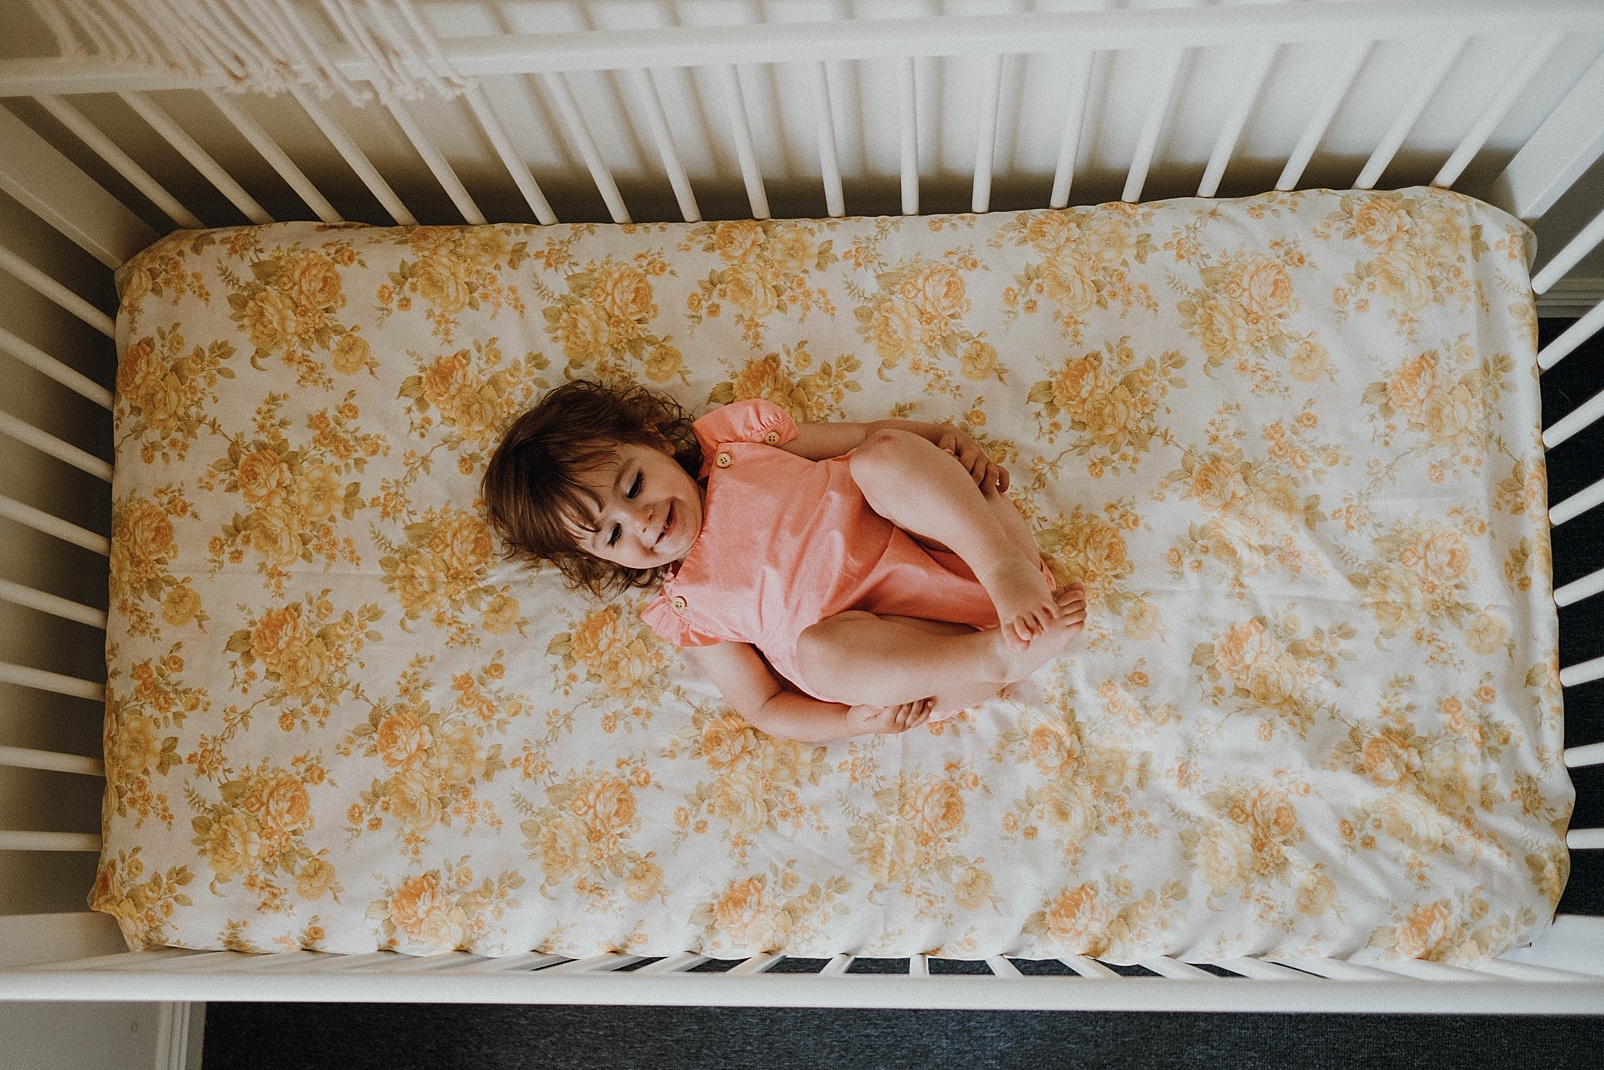 floral cot sheets